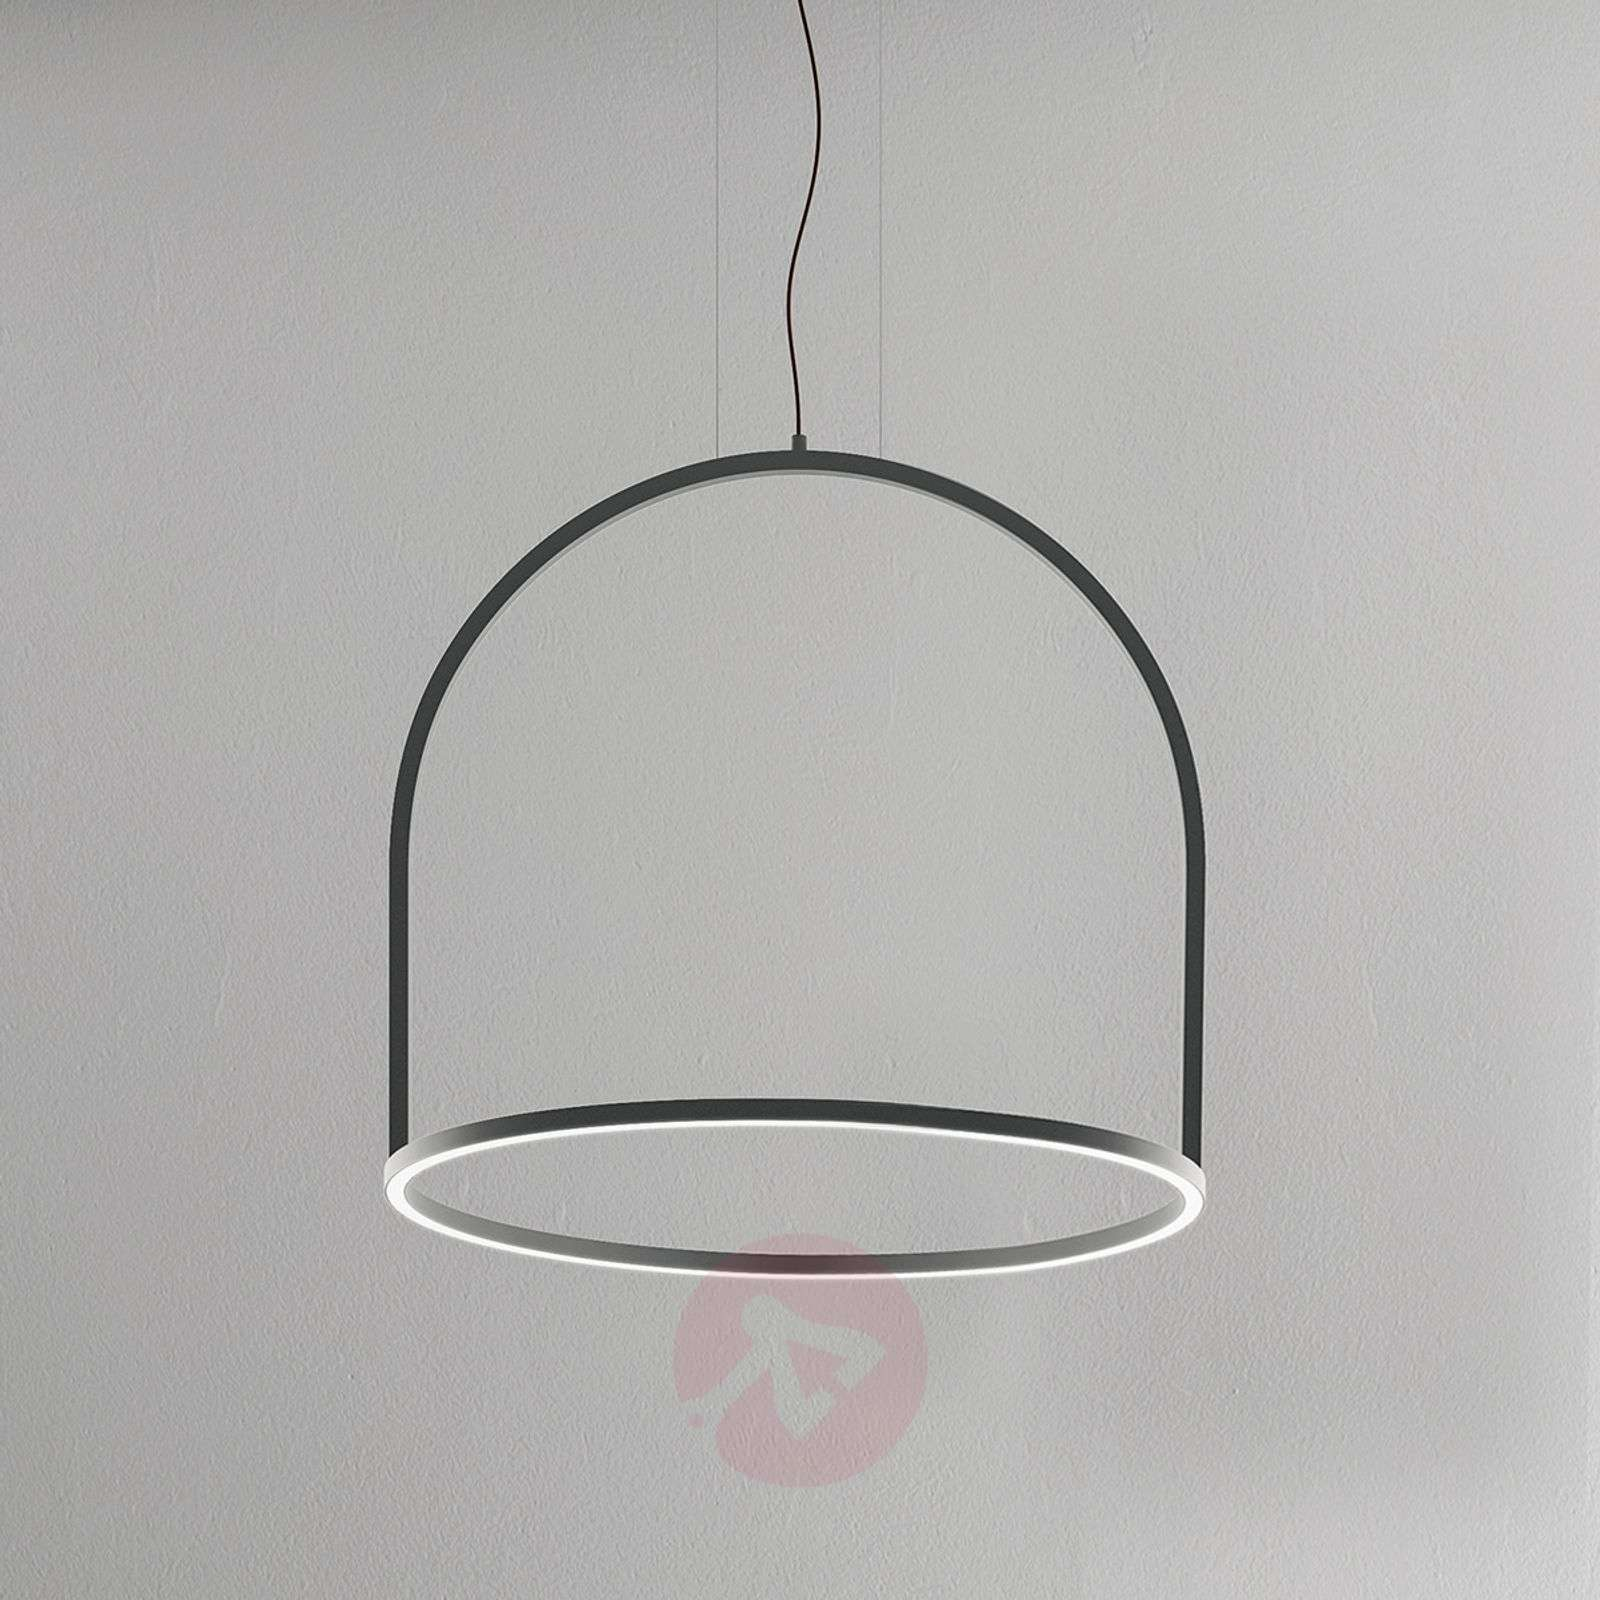 Erikoisesti muotoiltu U-Light-LED-riippuvalaisin-1088118-01